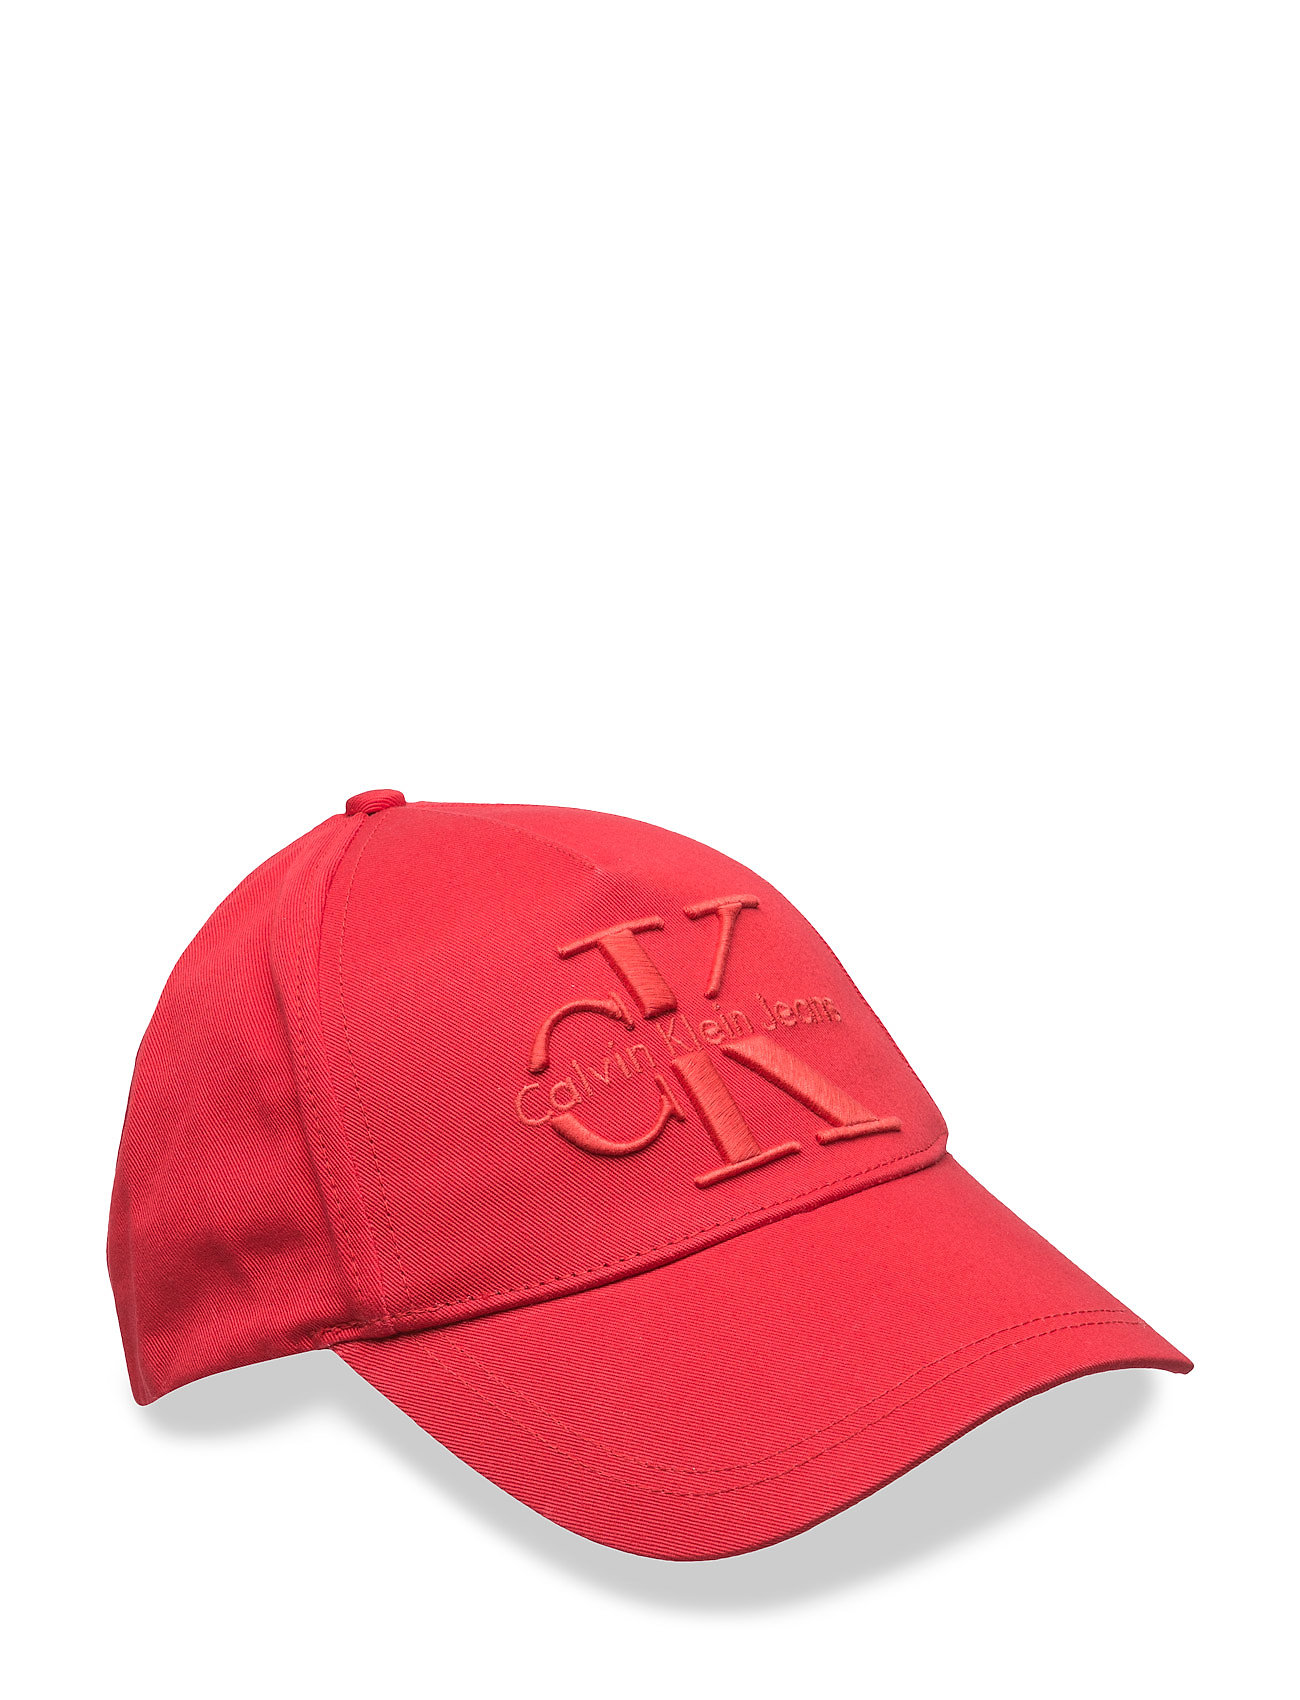 Re-Issue Cotton Cap, Calvin Klein Jeans Kasketter til Herrer i Fiery Red